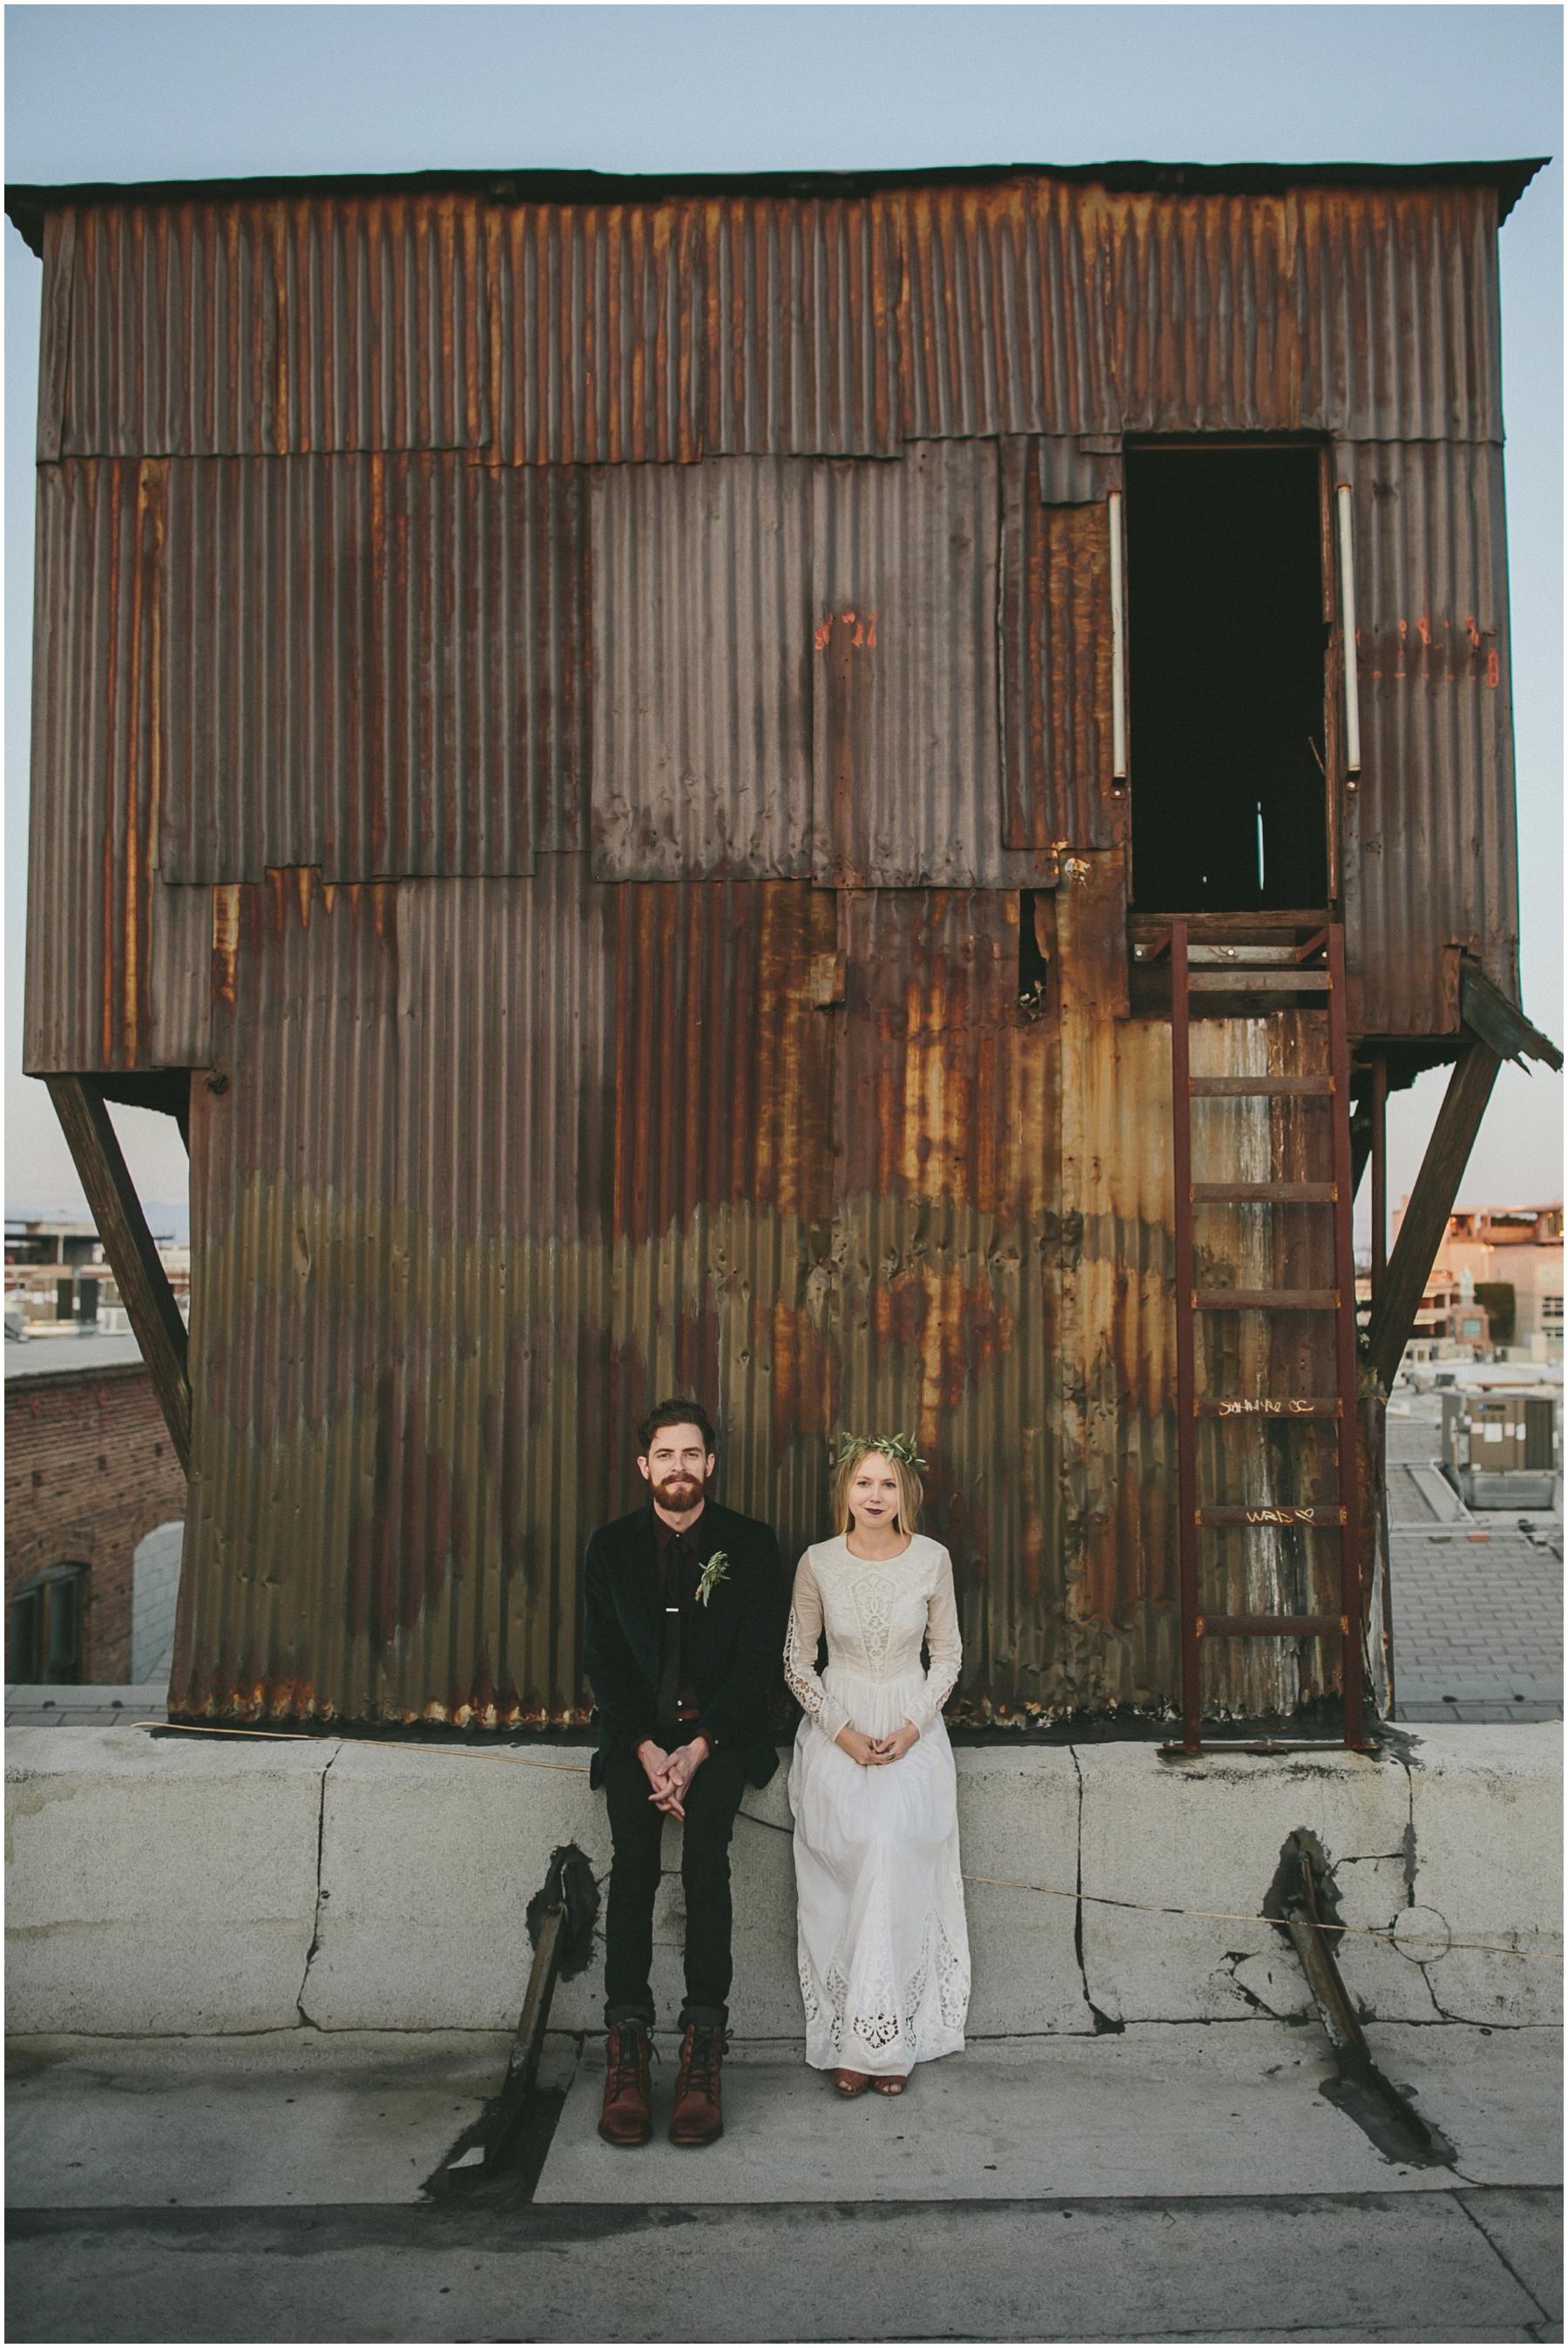 Natalie+Corey-WEDDING_KELLYBOITANO_0117